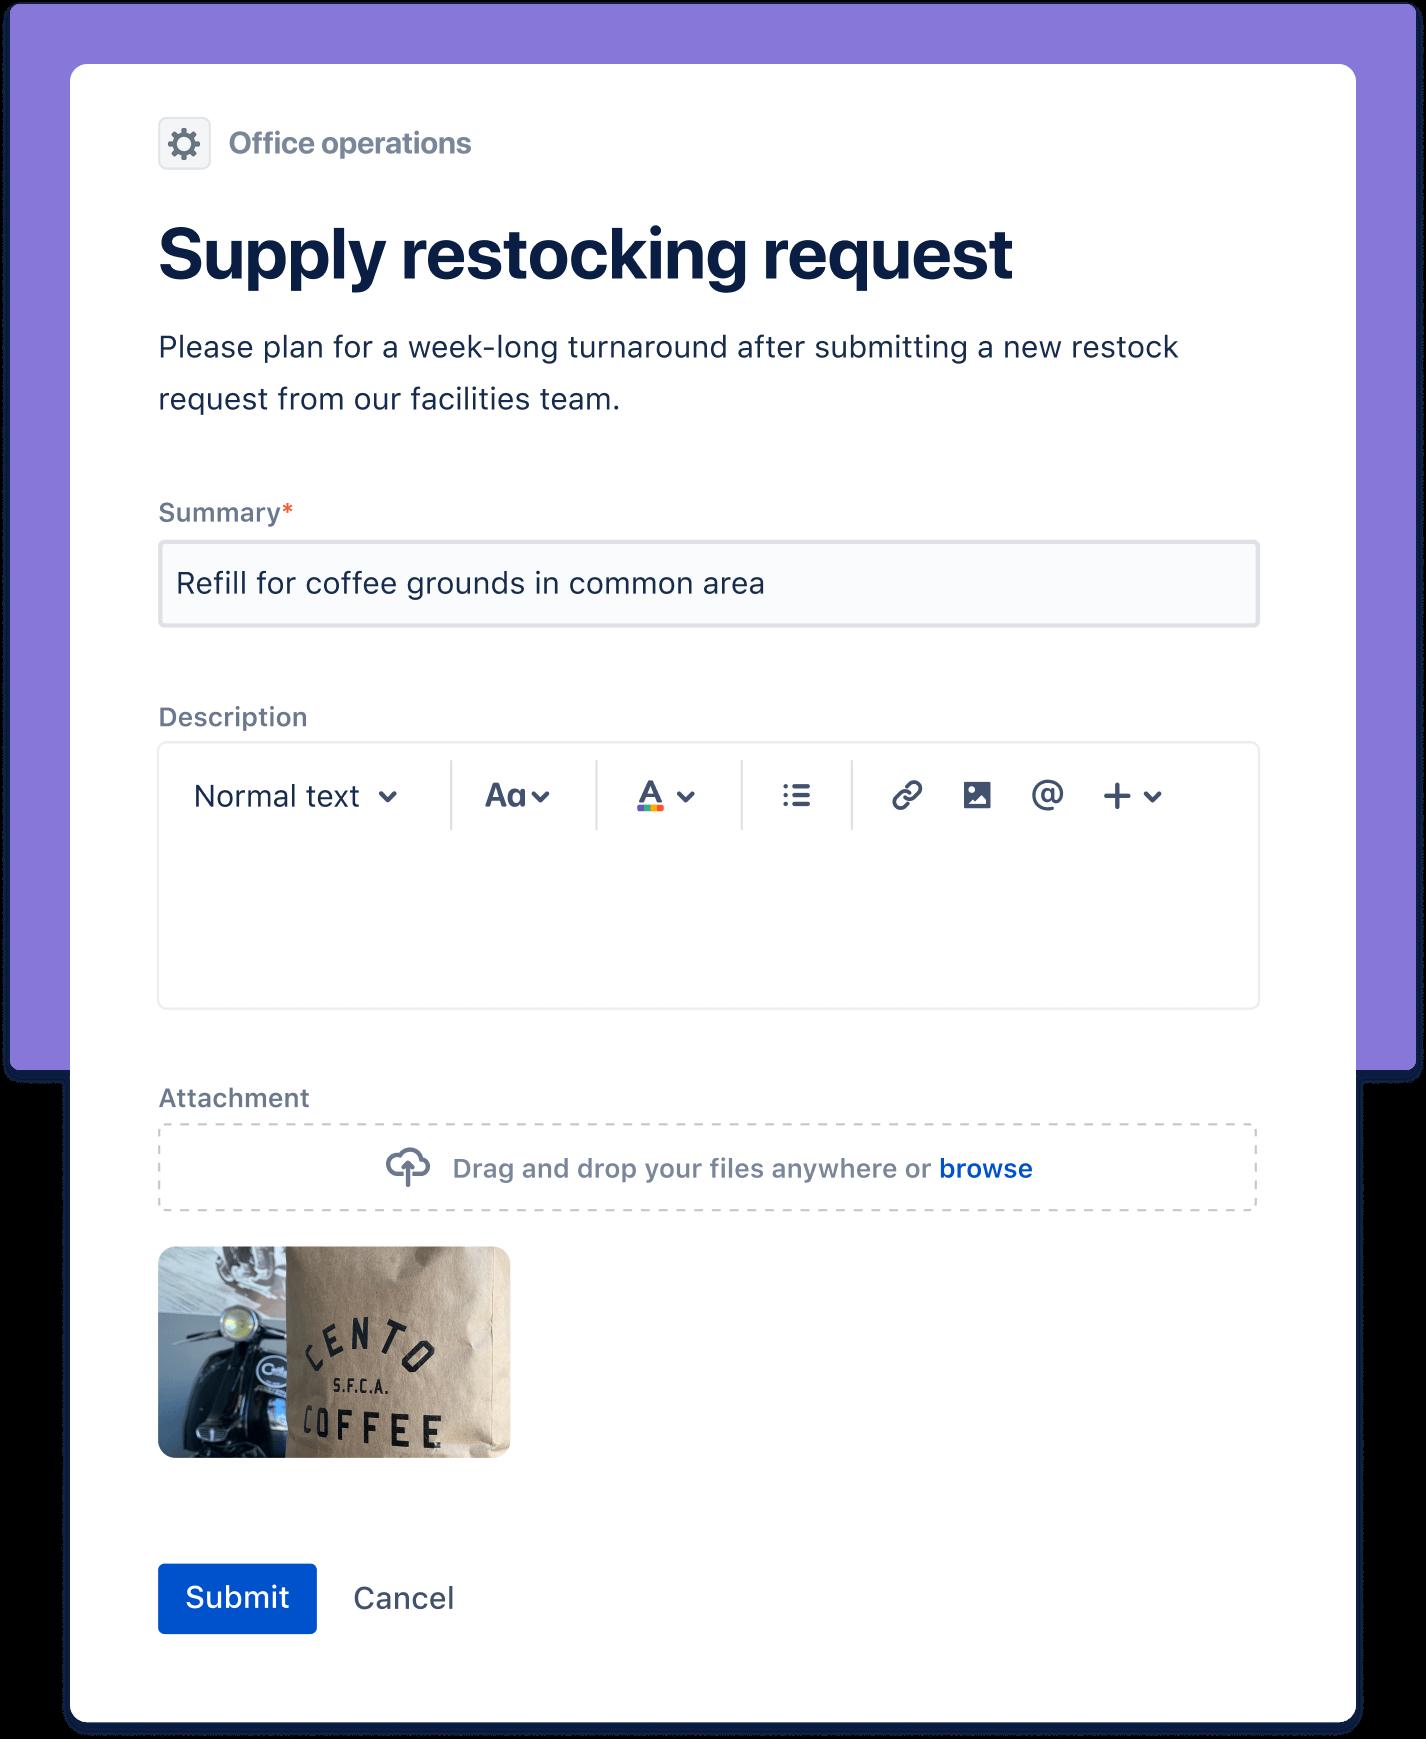 Supply restocking request screenshot